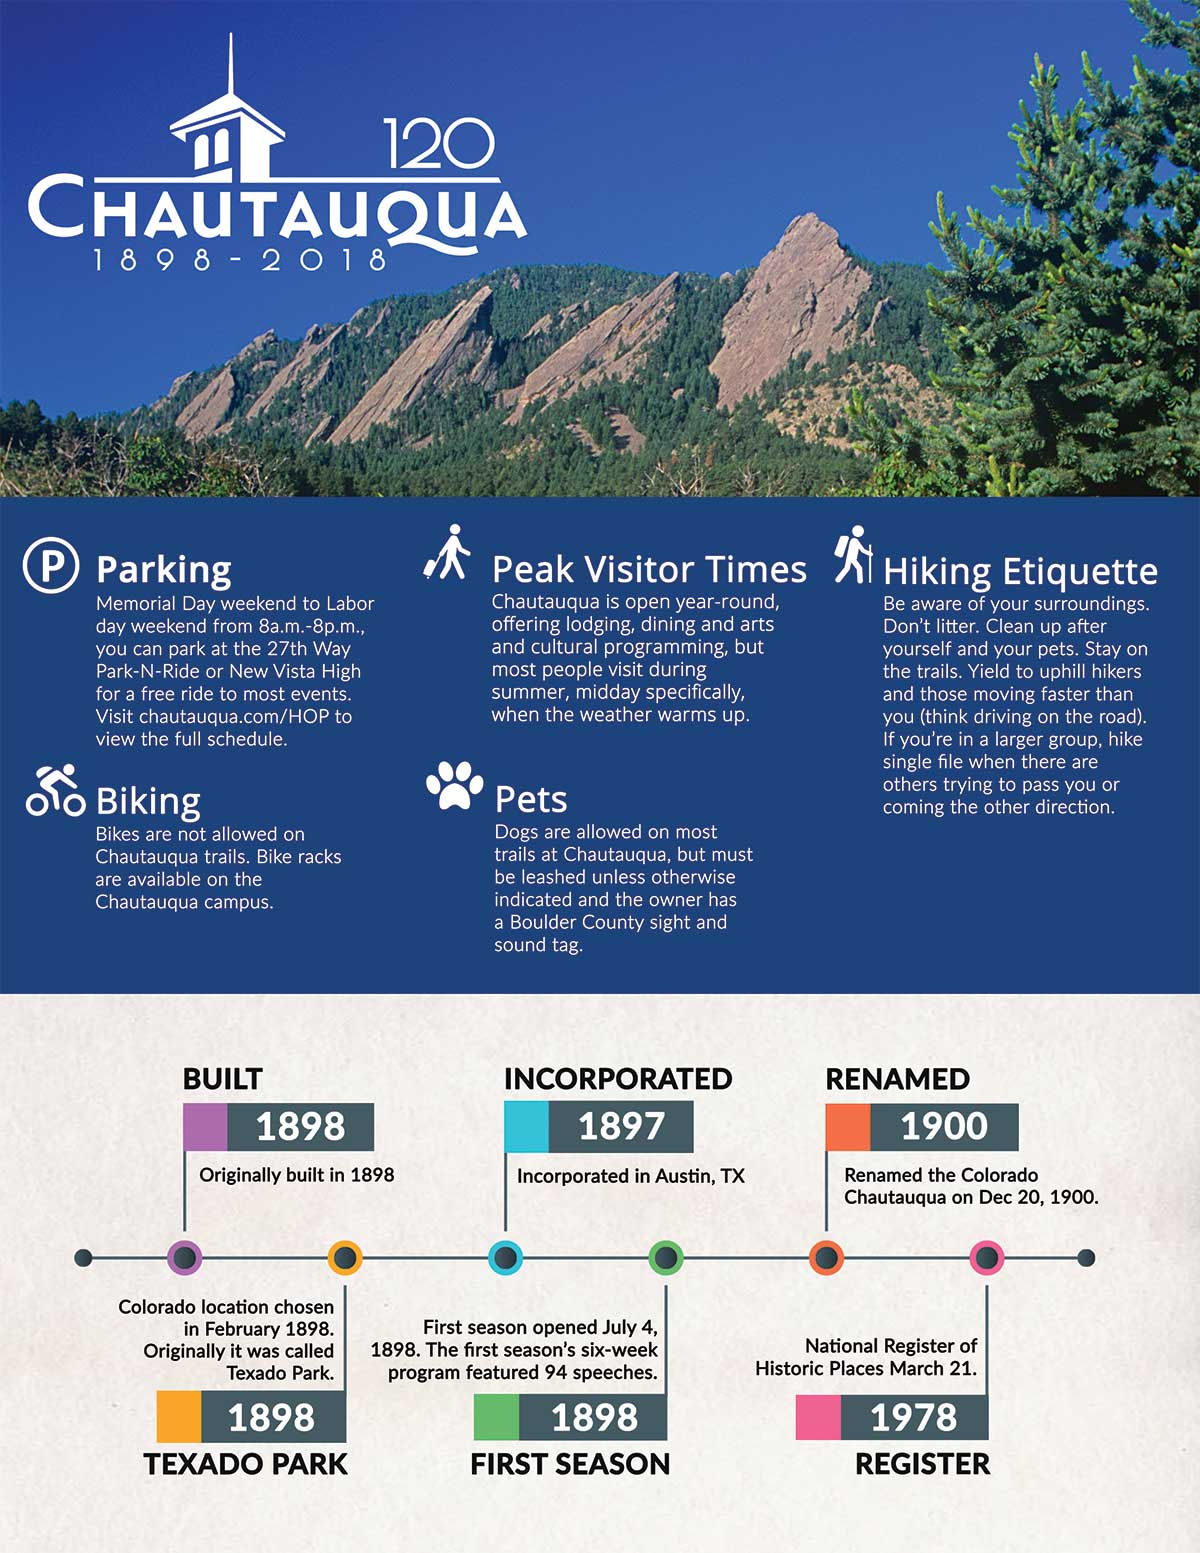 Chautauqua Infographic